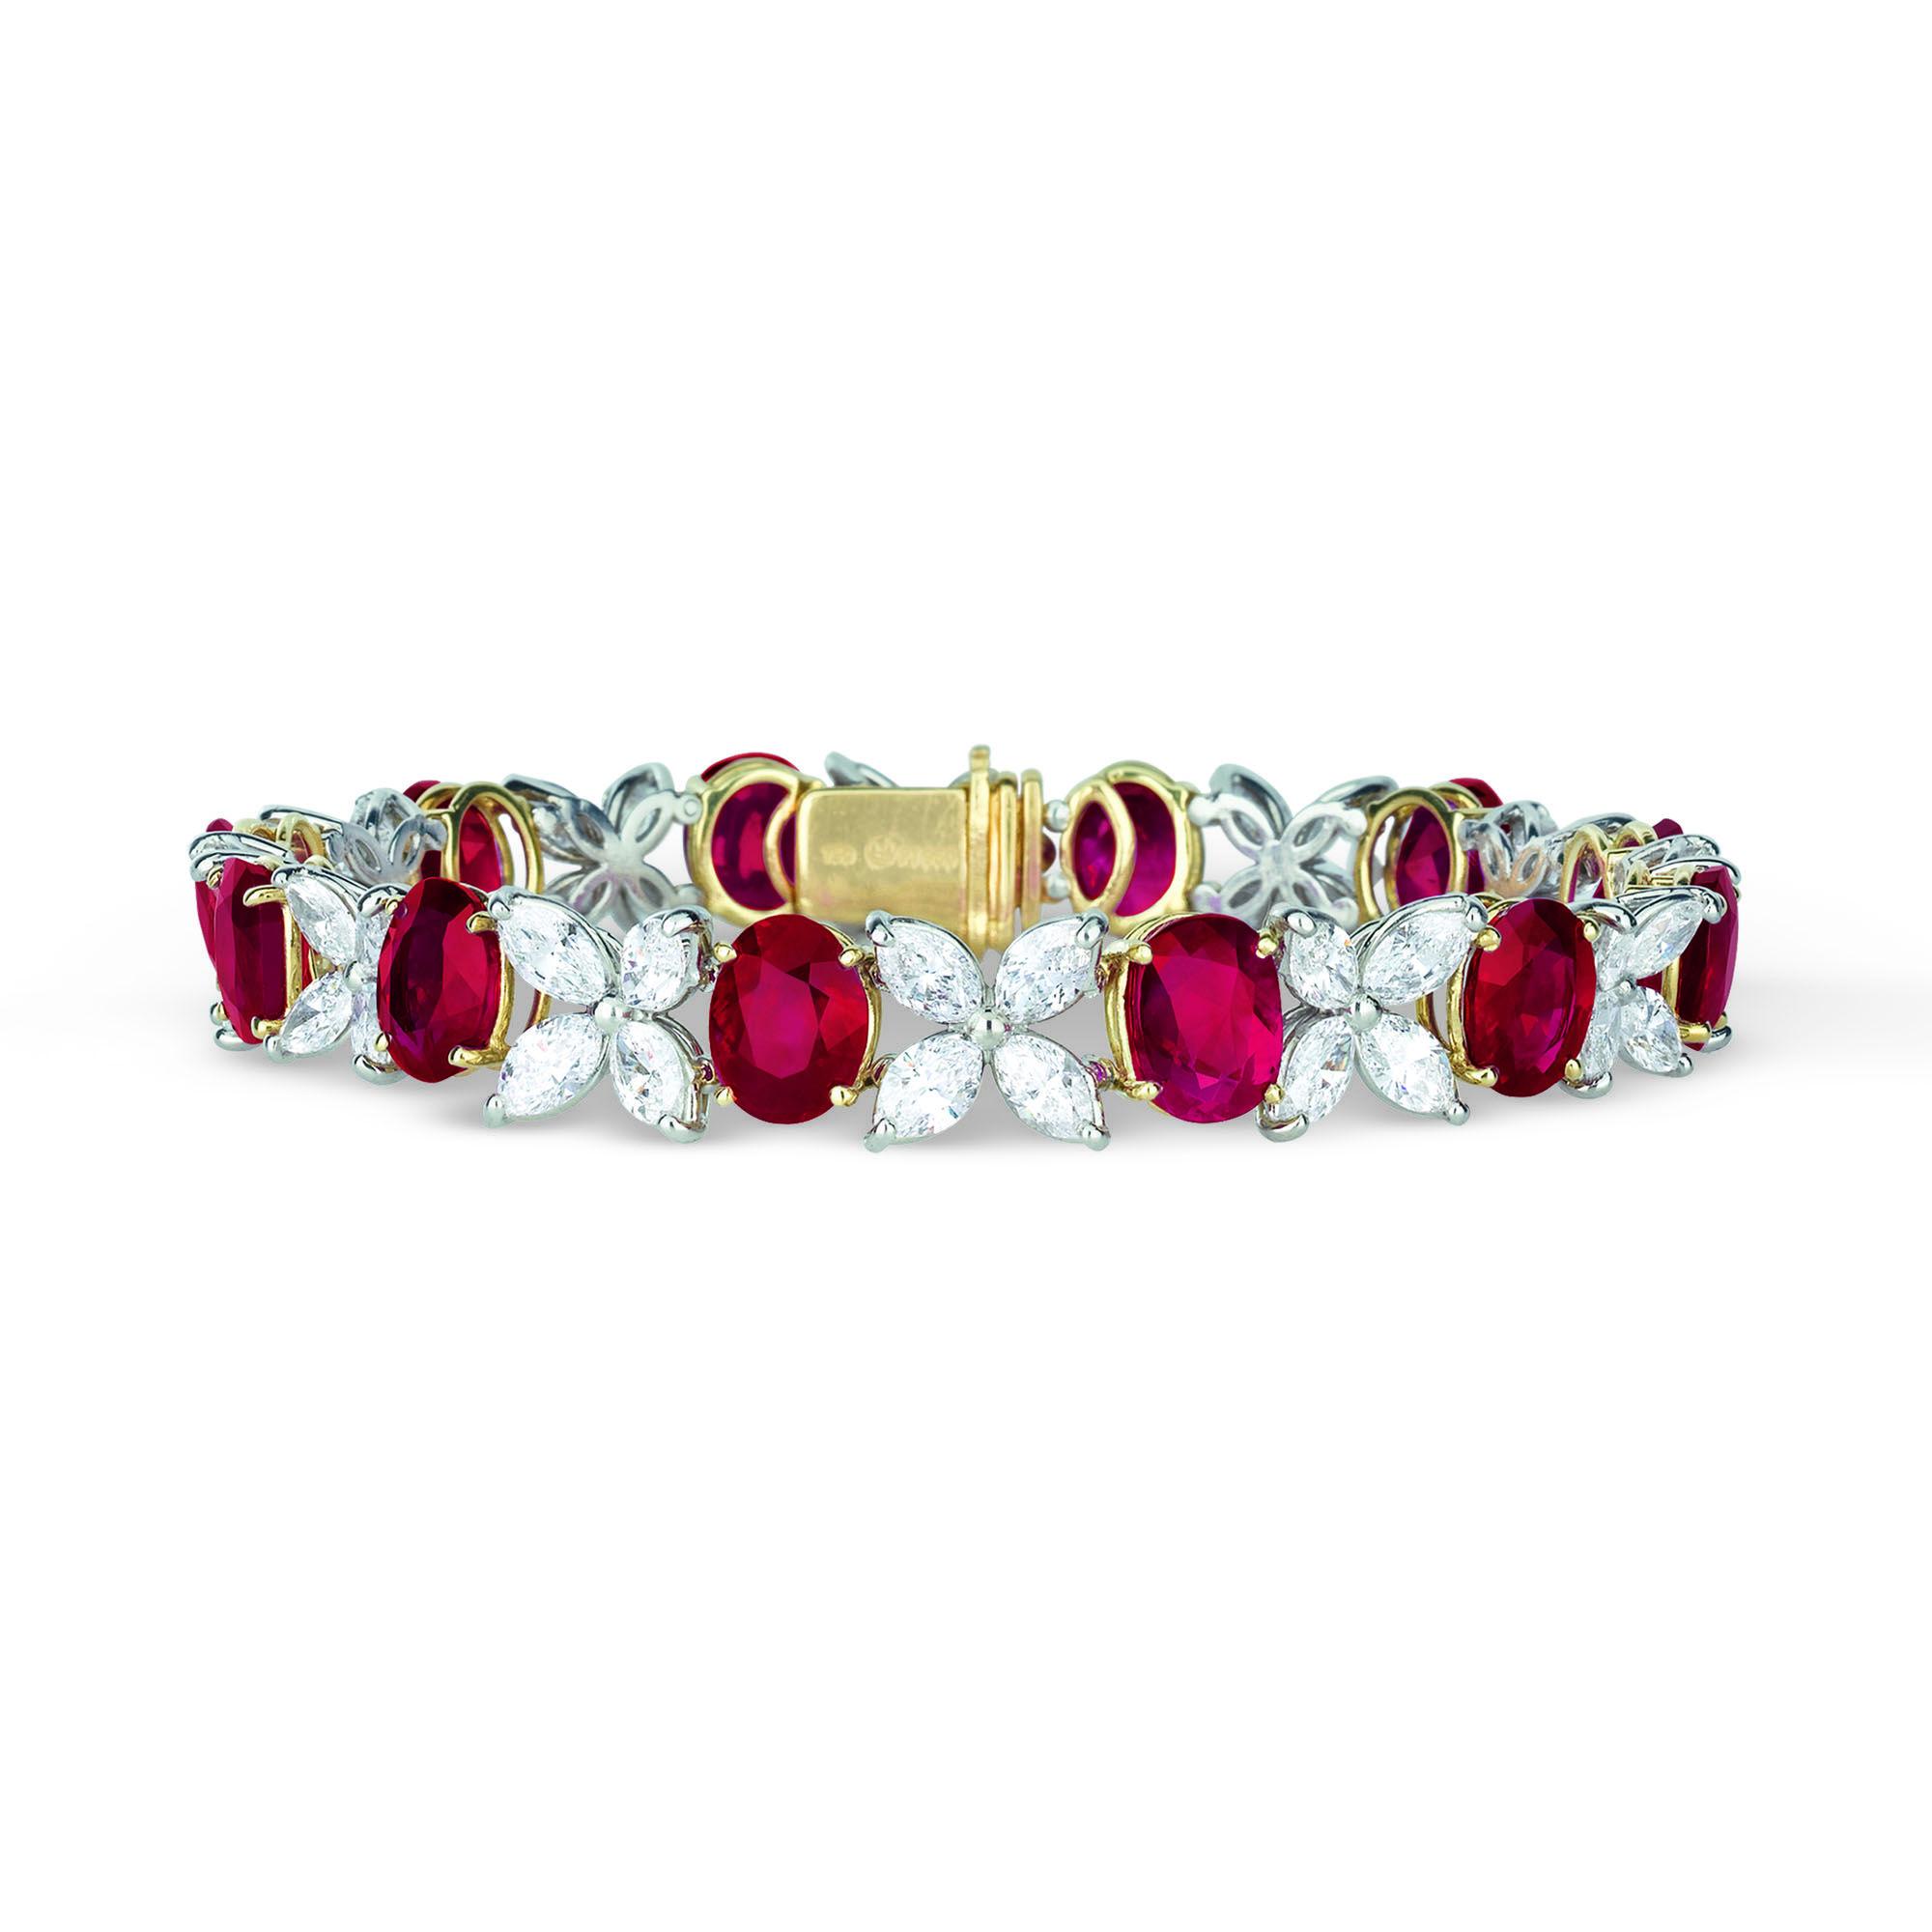 9acbf34fda7 12 Untreated Burma Ruby and Diamond Bracelet 22.85 Carats